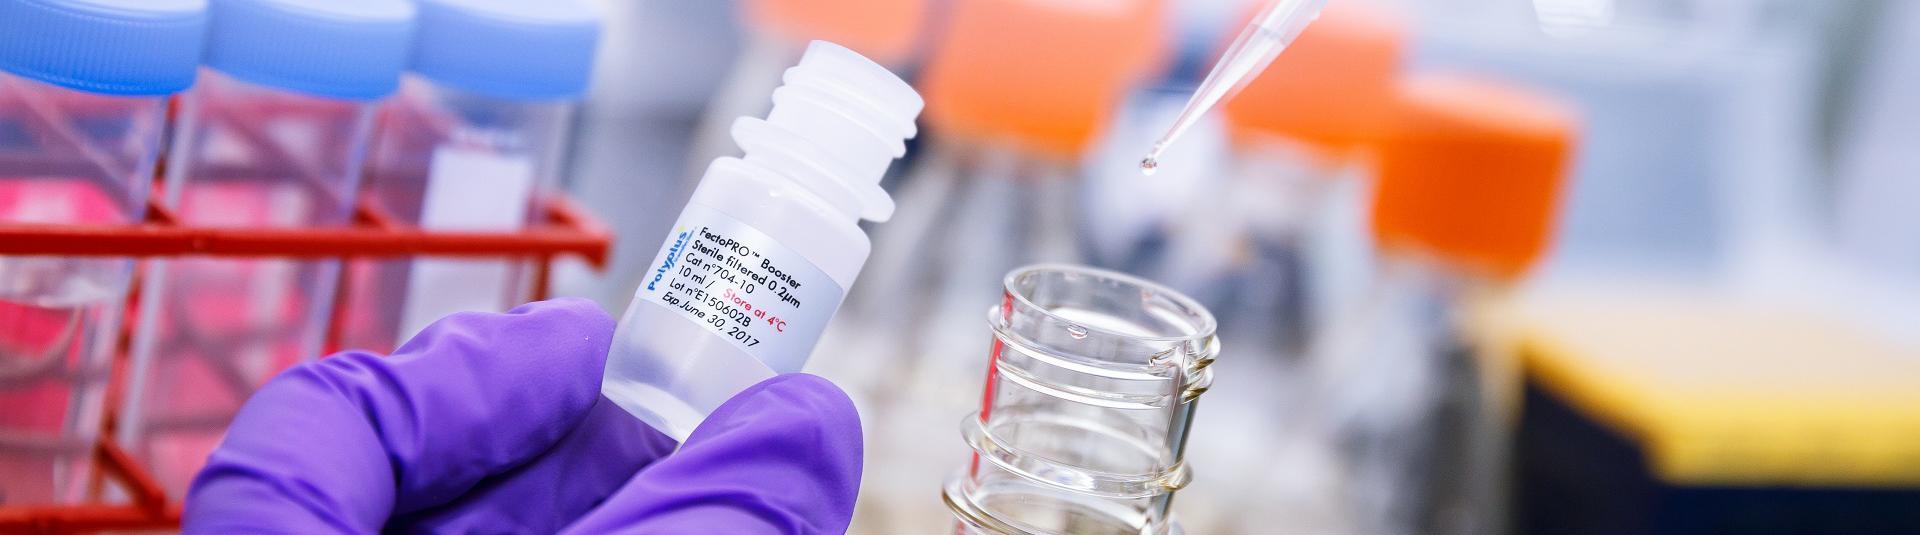 Polyplus-transfection - Bioproduction